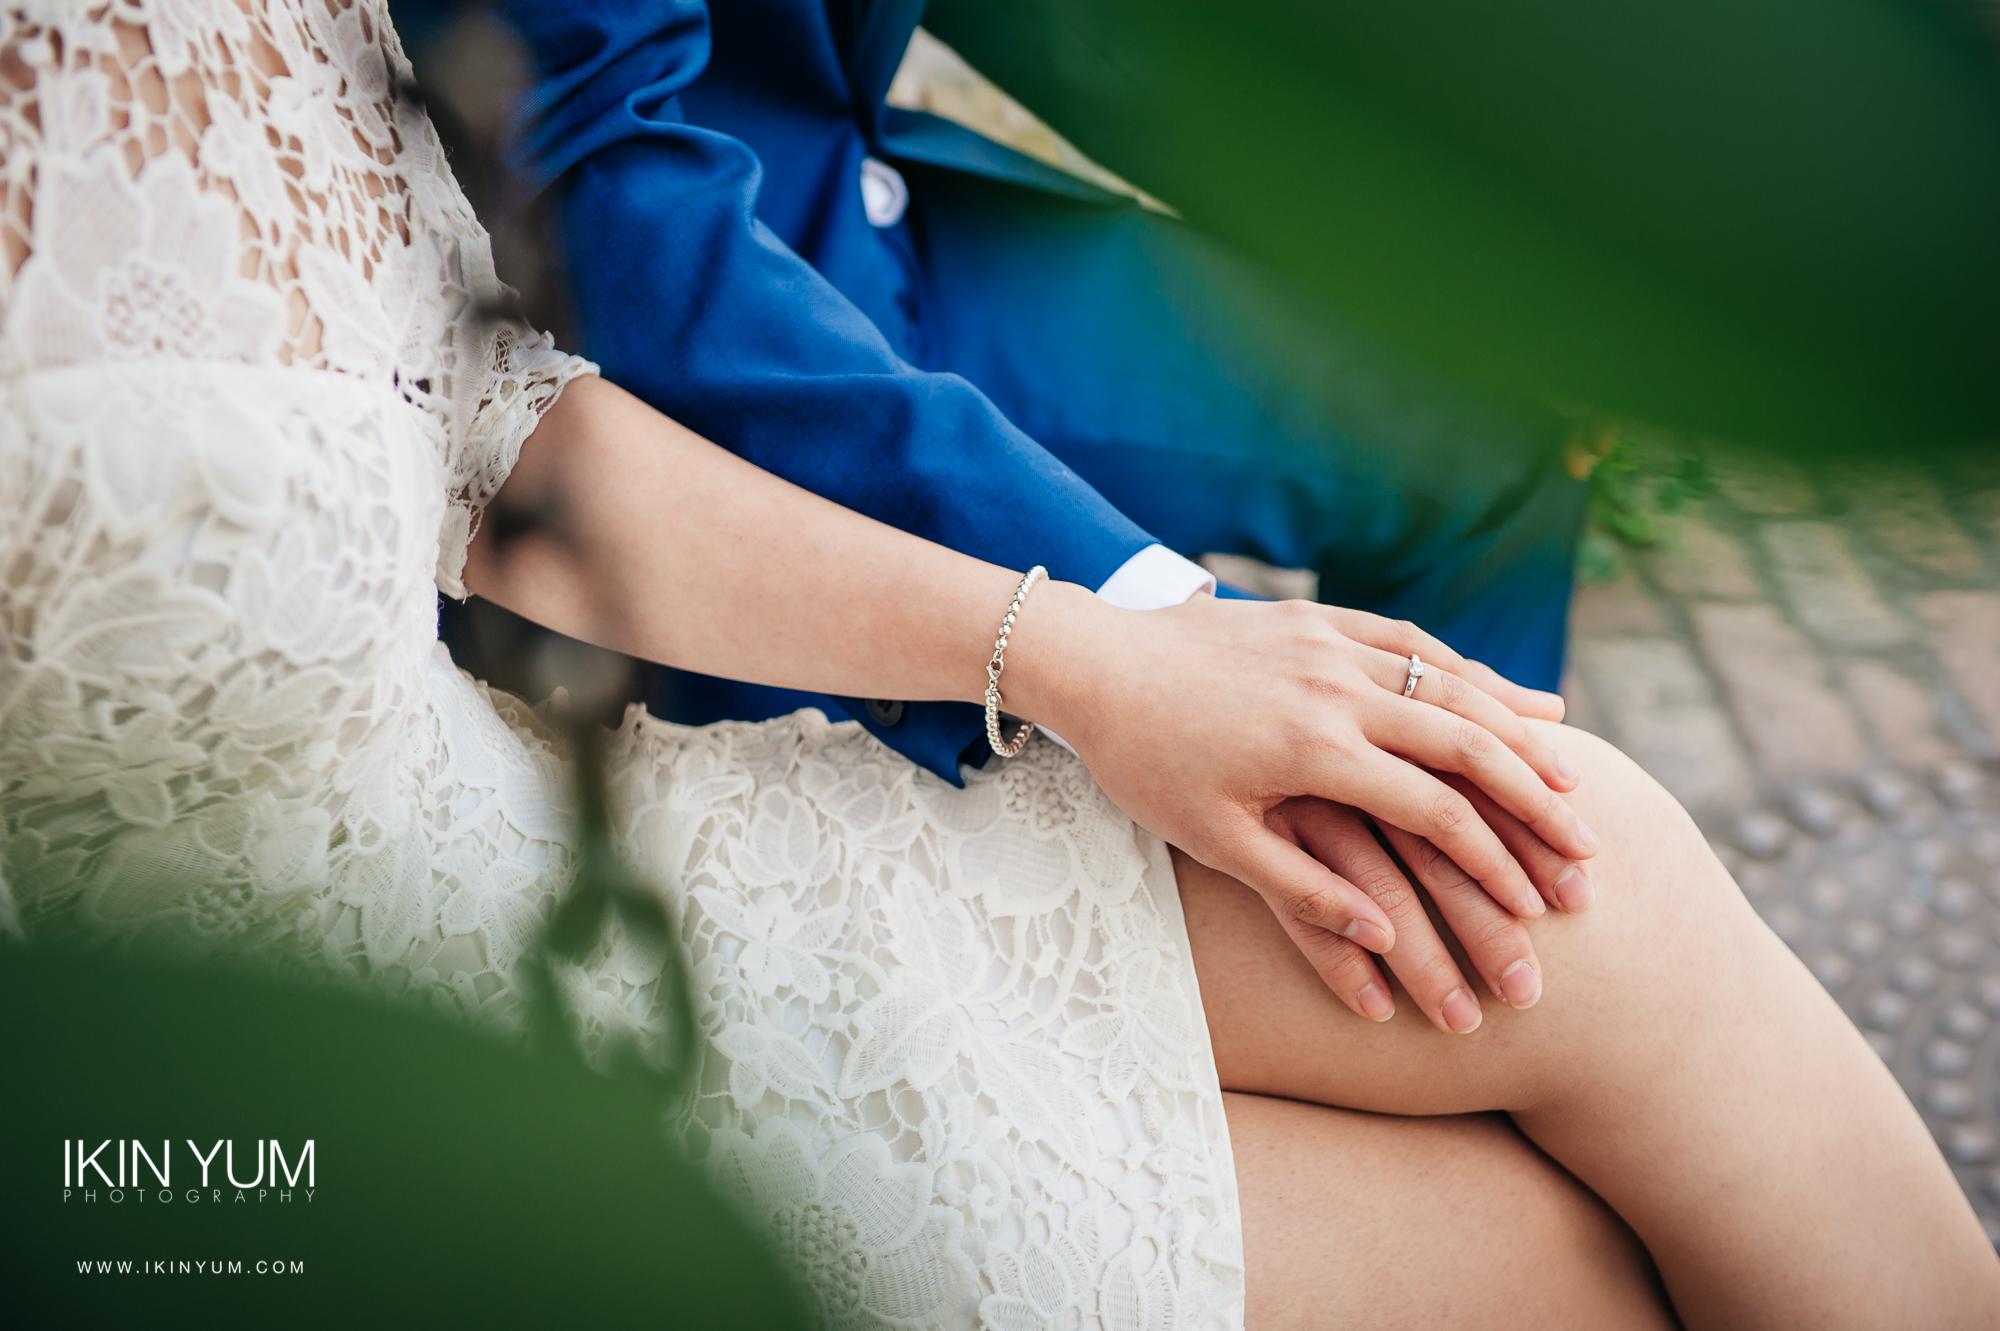 Natalie & Duncan Wedding Day - Ikin Yum Photography-072.jpg